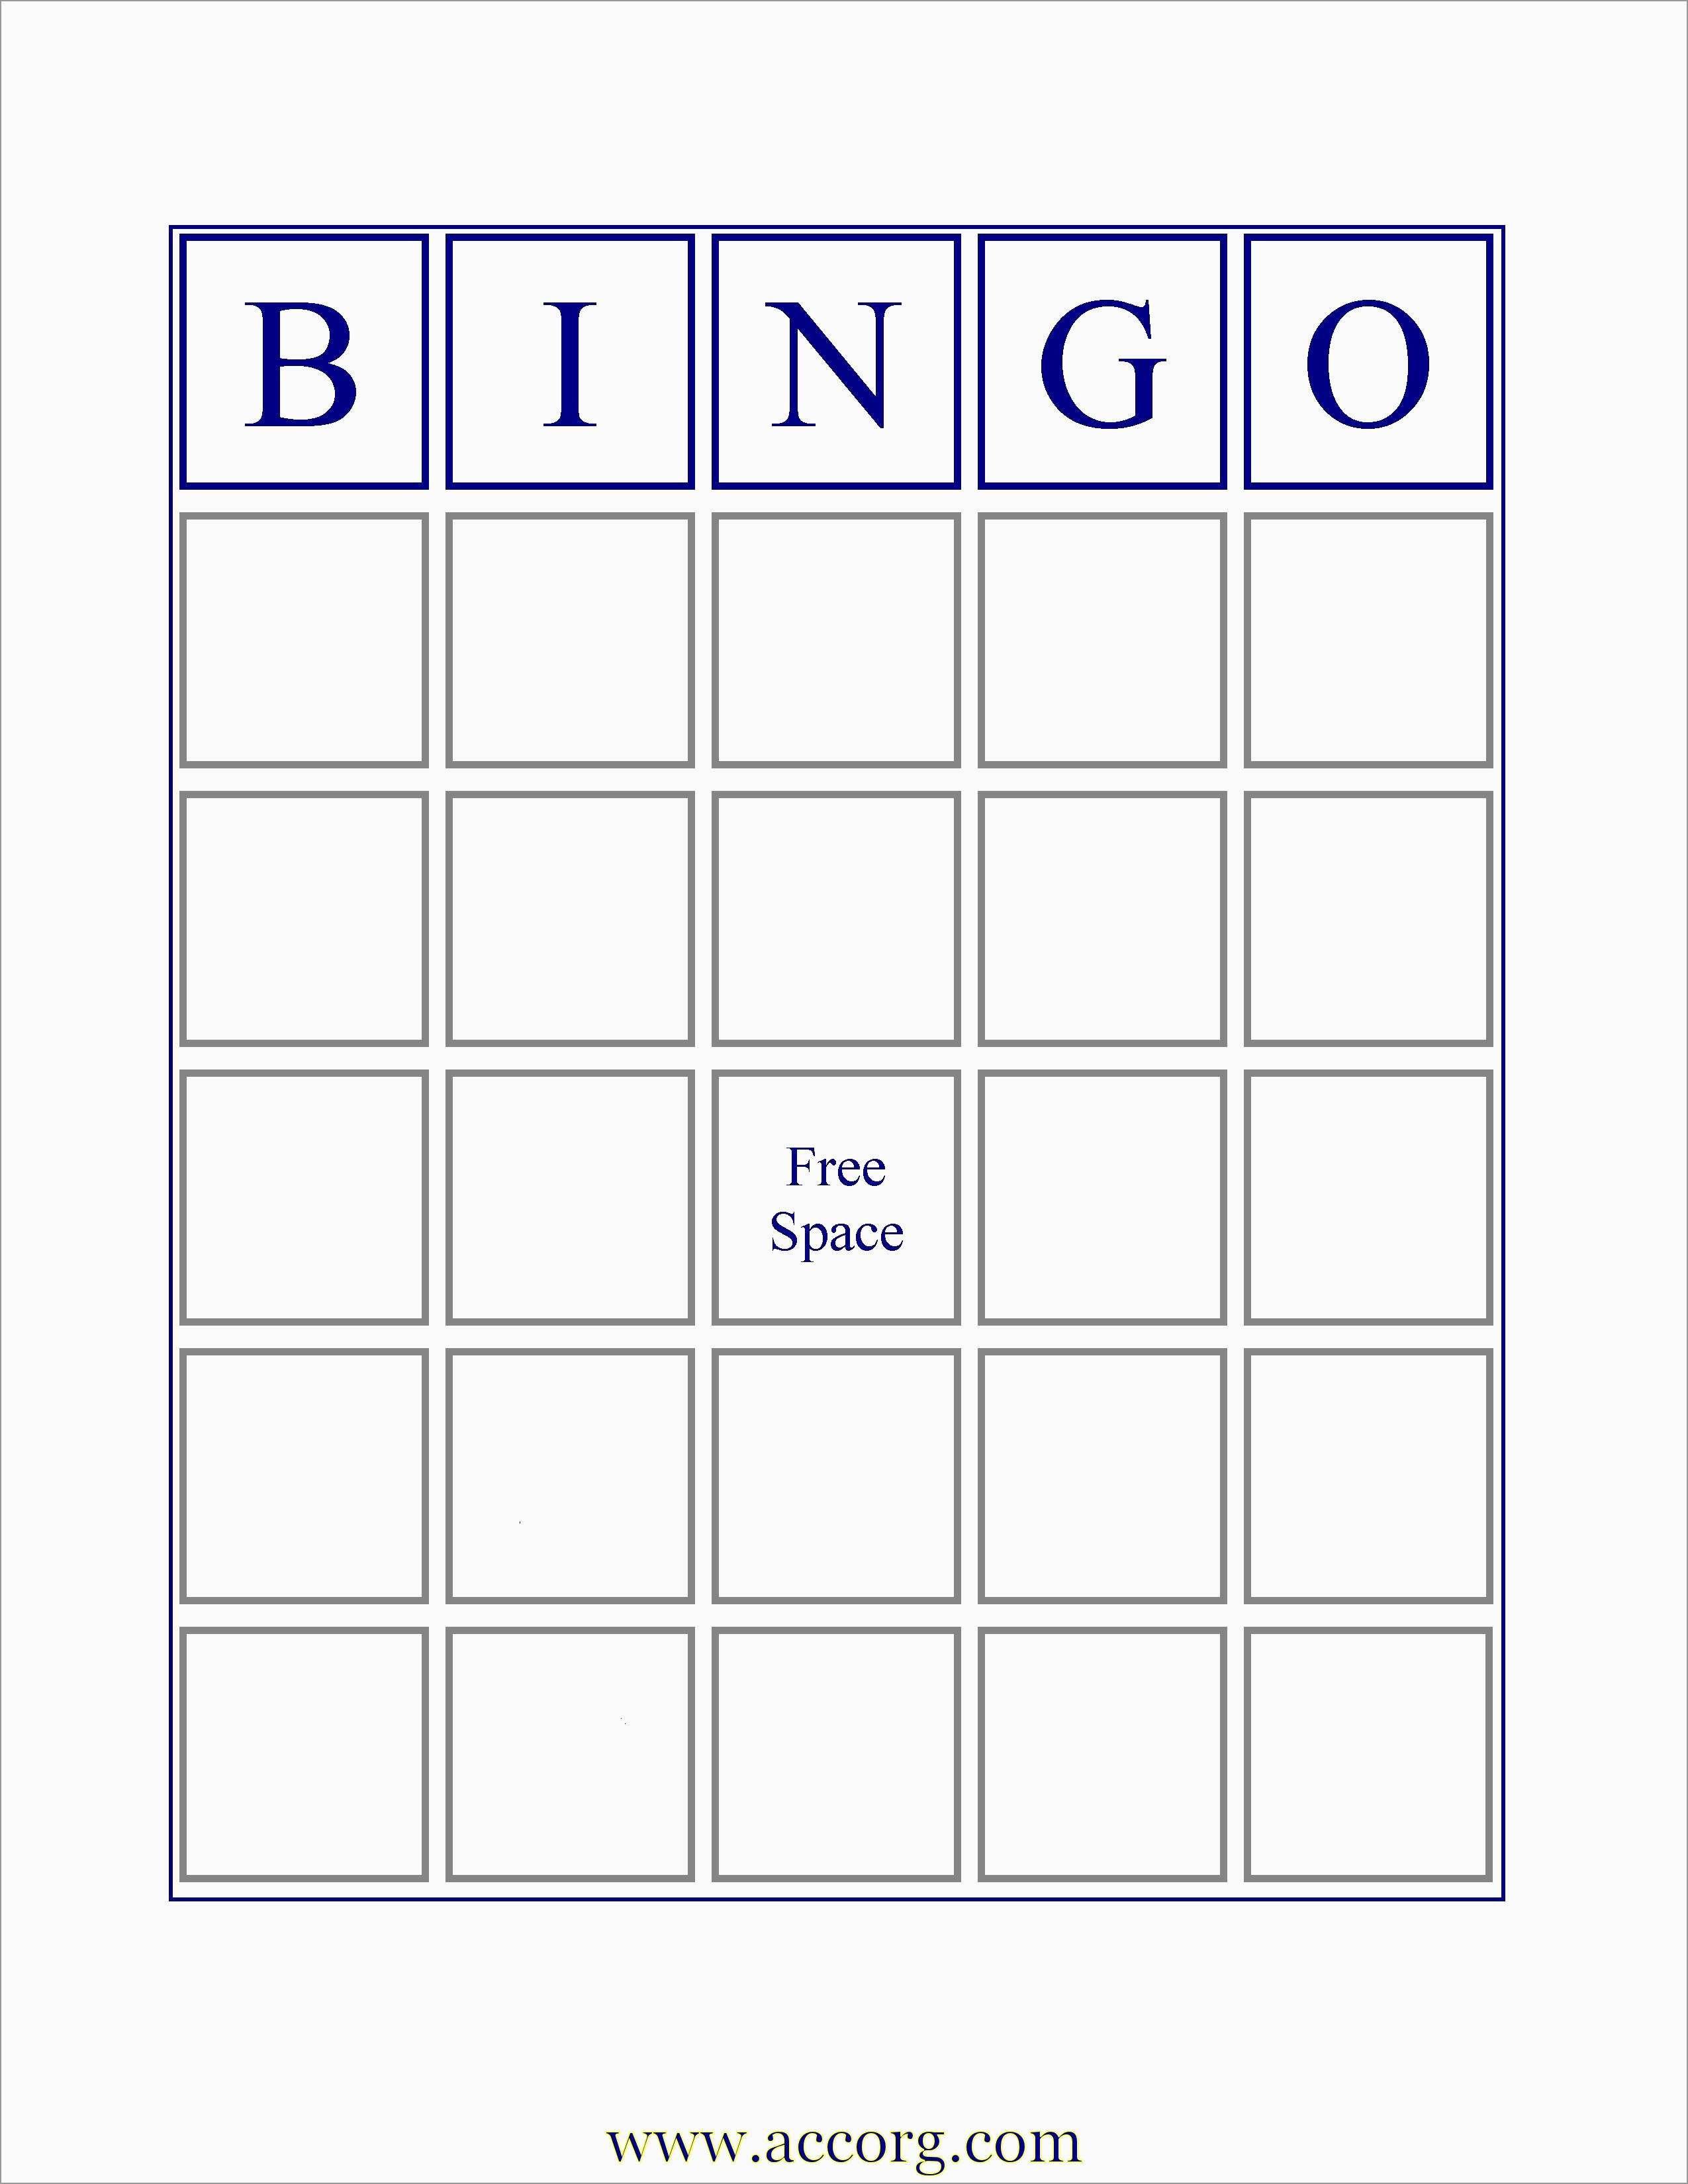 Luxury Bingo Card Template Free | Best Of Template - Free Printable Bingo Maker